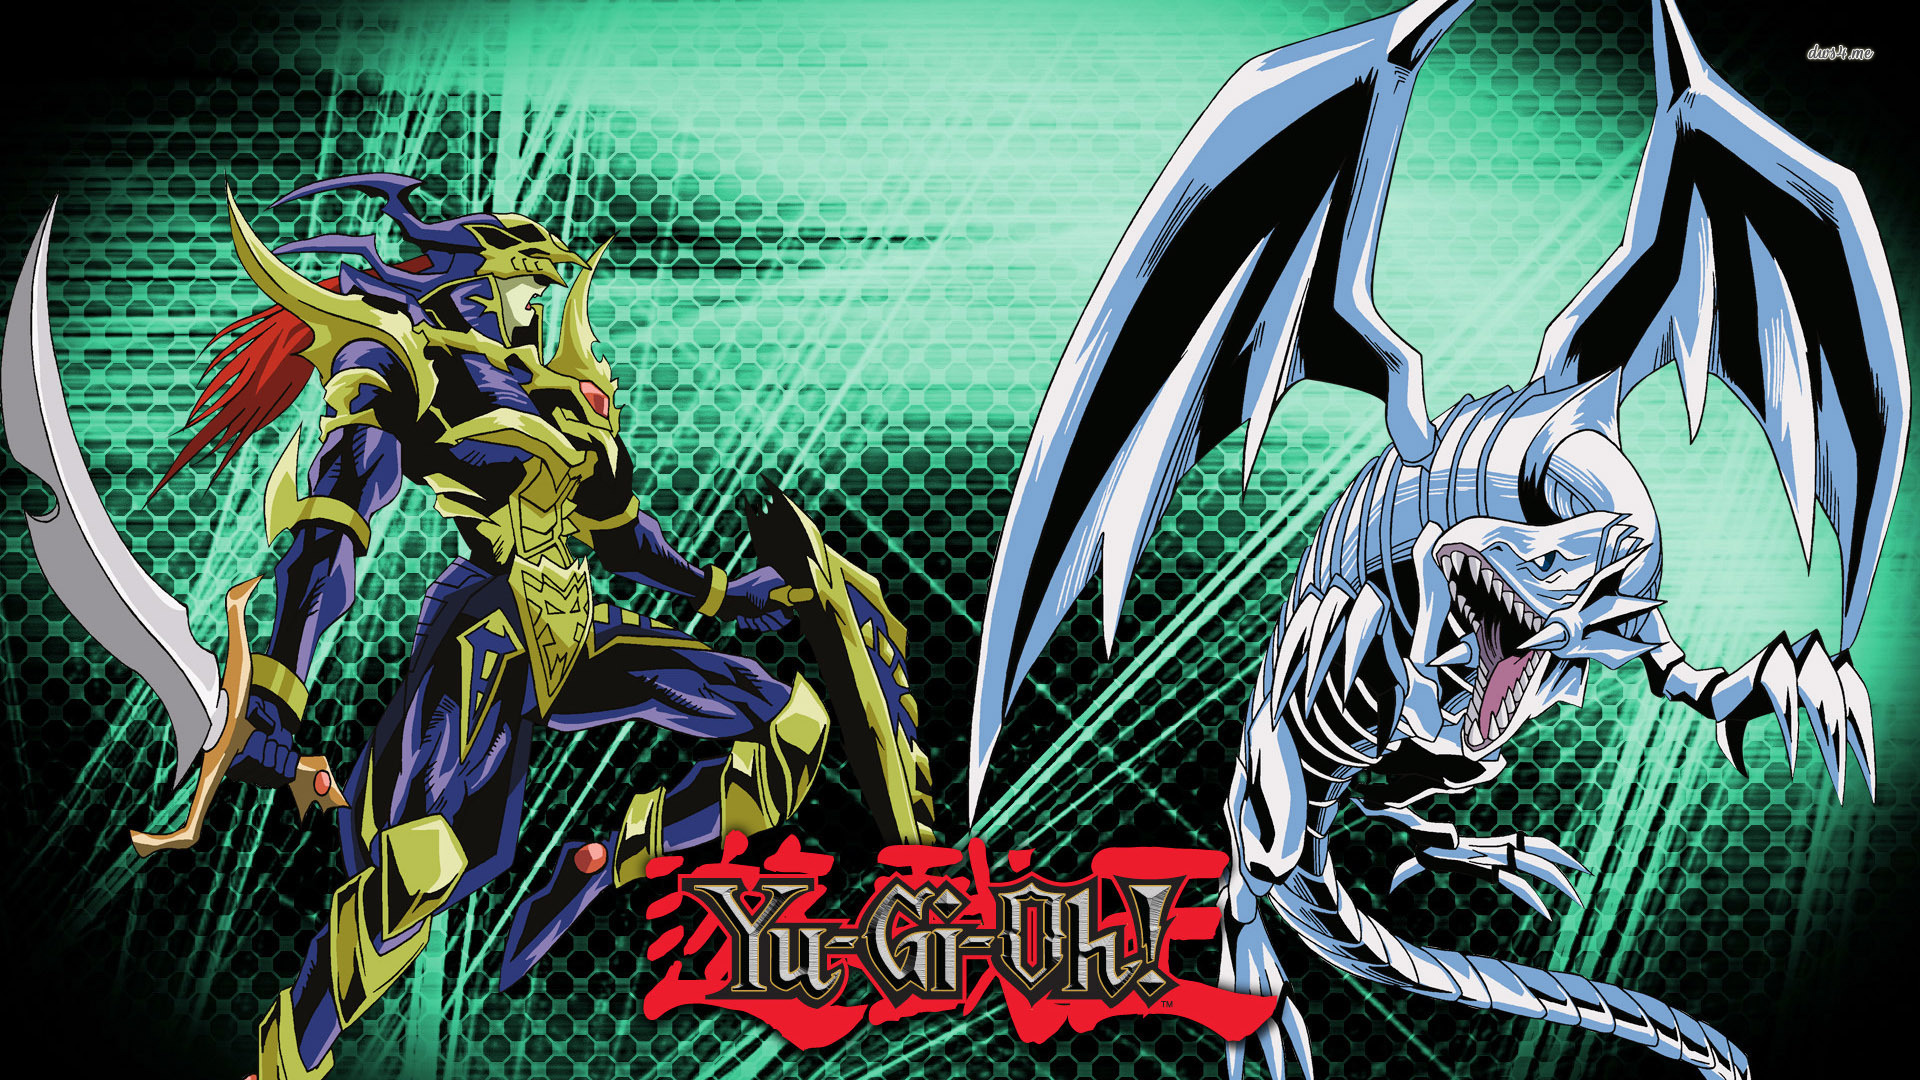 Download 5400 Koleksi Wallpaper Anime Hd Pinterest Terbaik